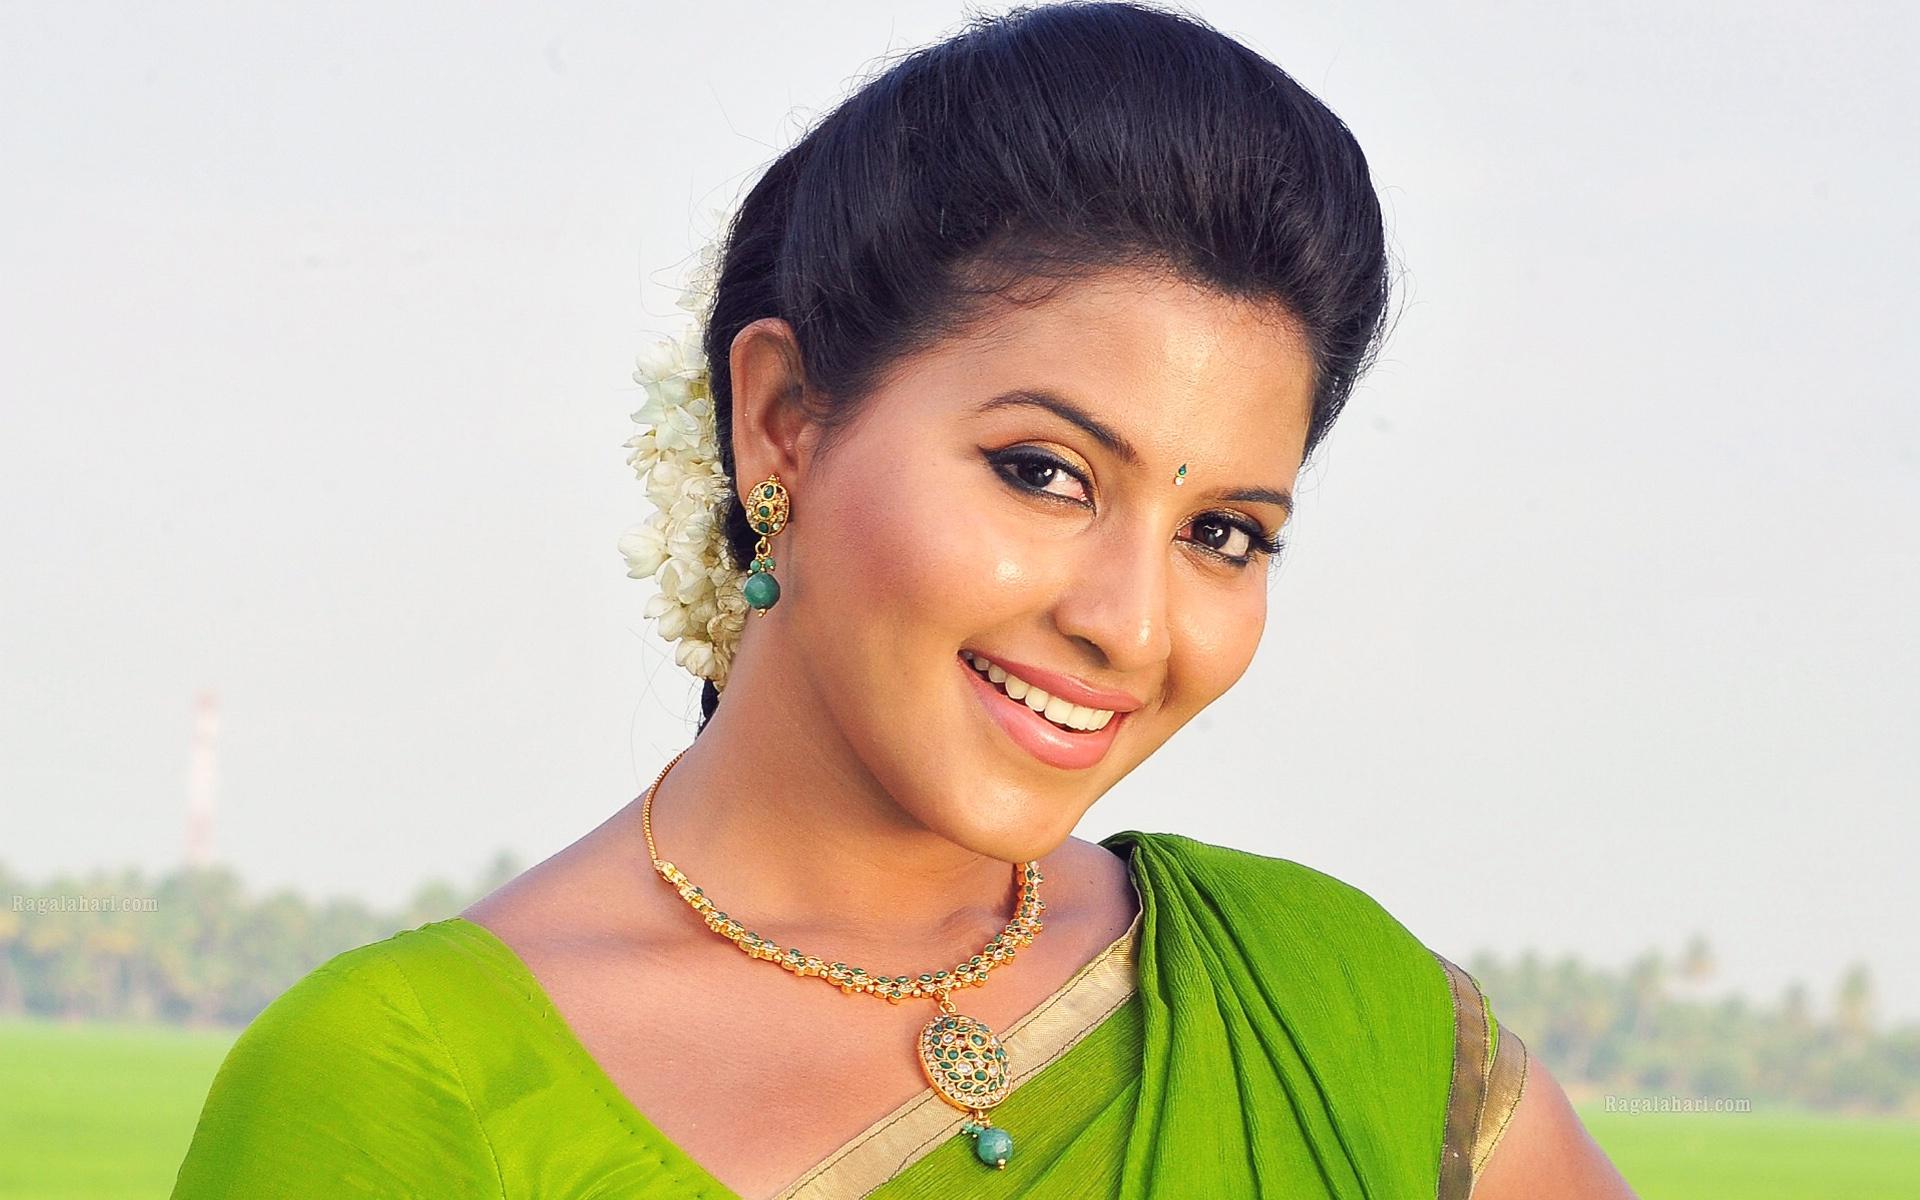 Actor Anjali Photos: Anjali Telugu Actress Wallpapers In Jpg Format For Free